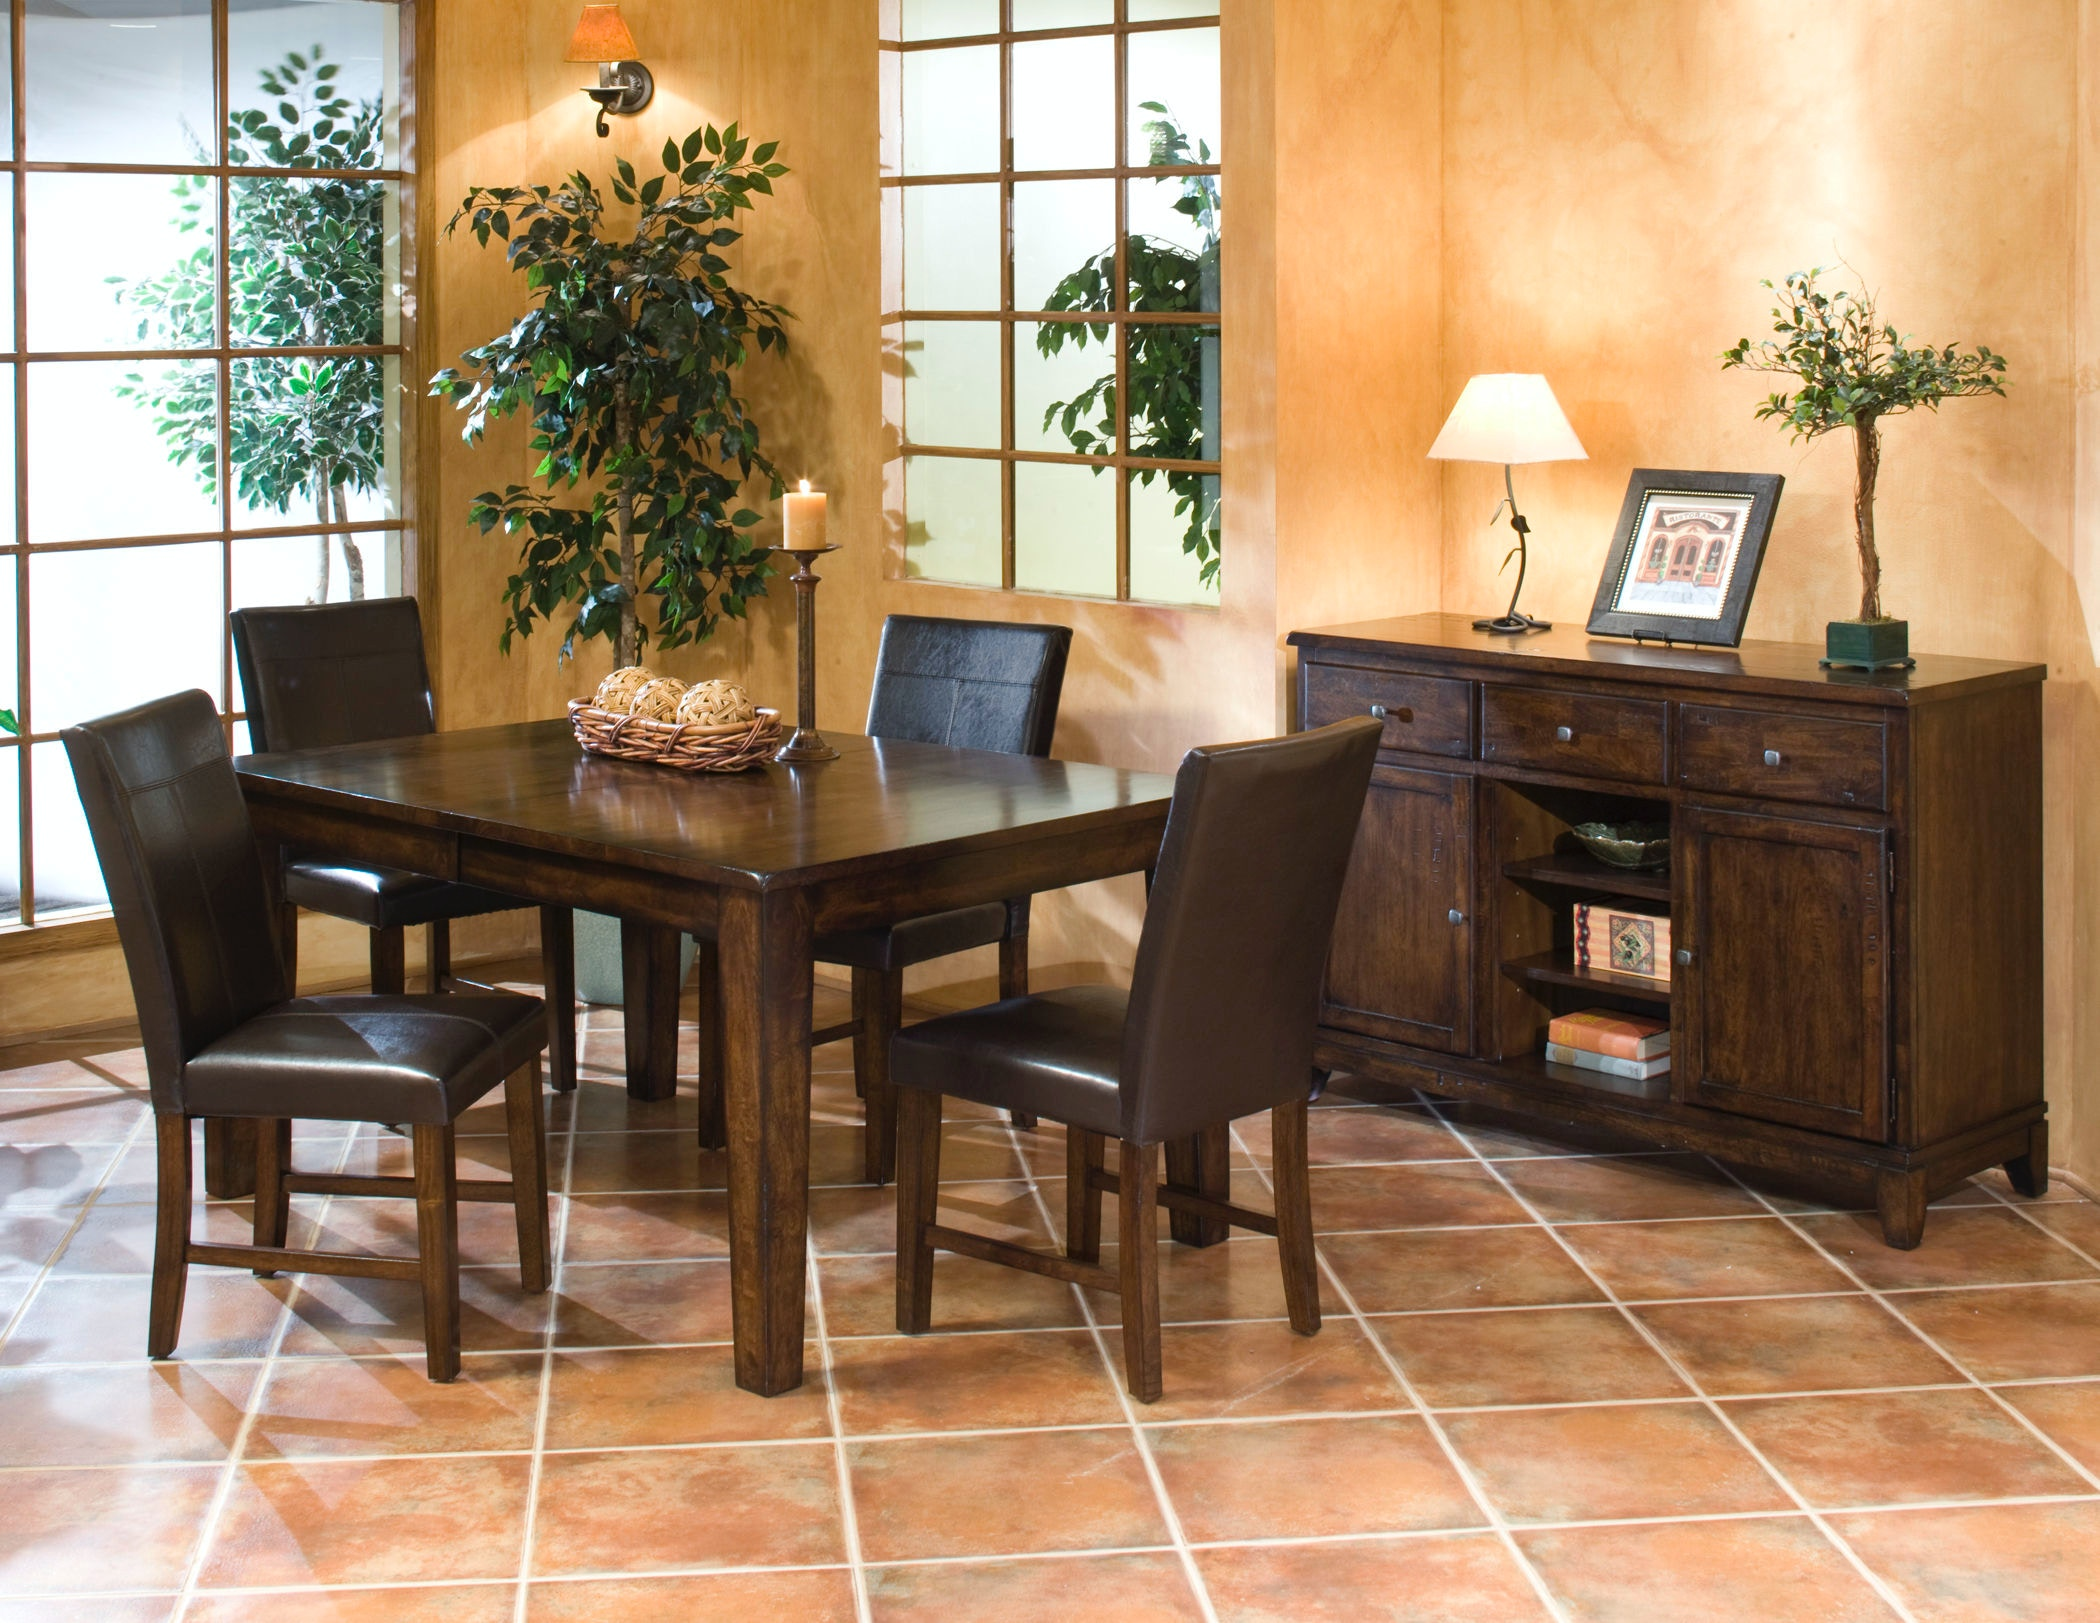 Intercon Dining Room Kona Butterfly Leaf Dining Table KA TA 4278B